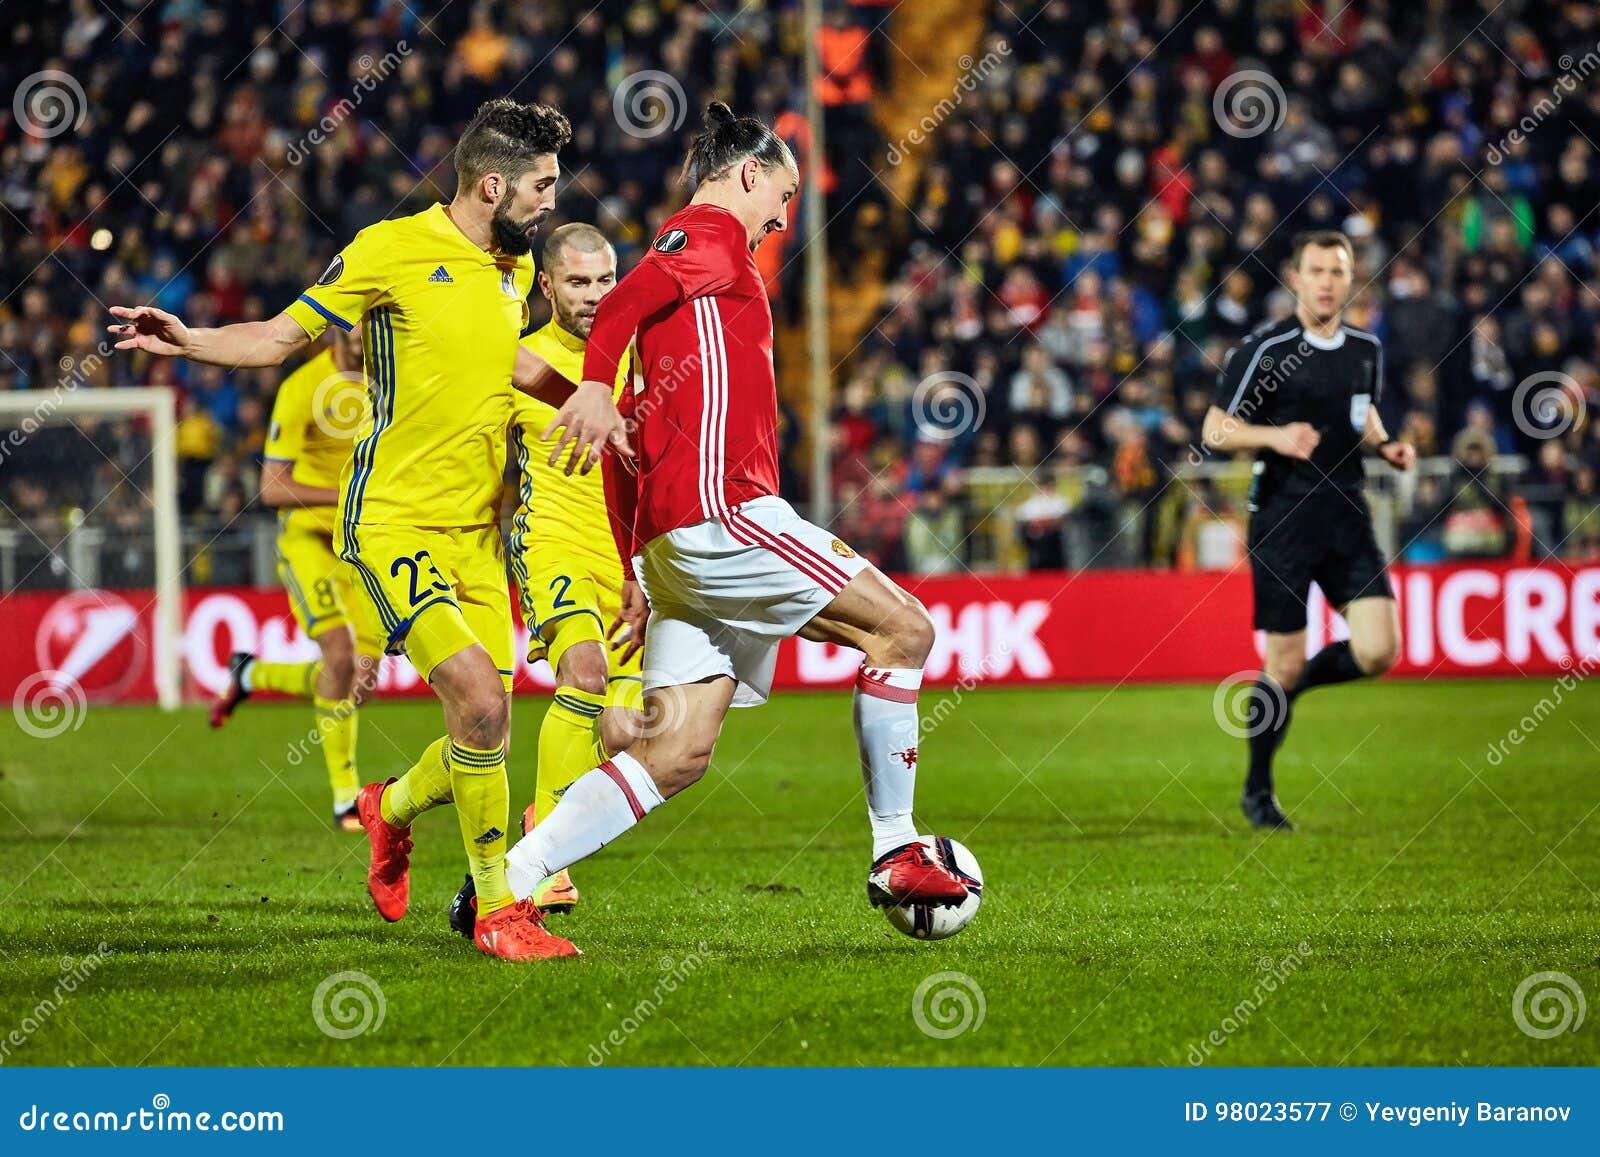 e2b433fbe Zlatan Ibrahimovic Feyenoord Game Moments Editorial Photography ...